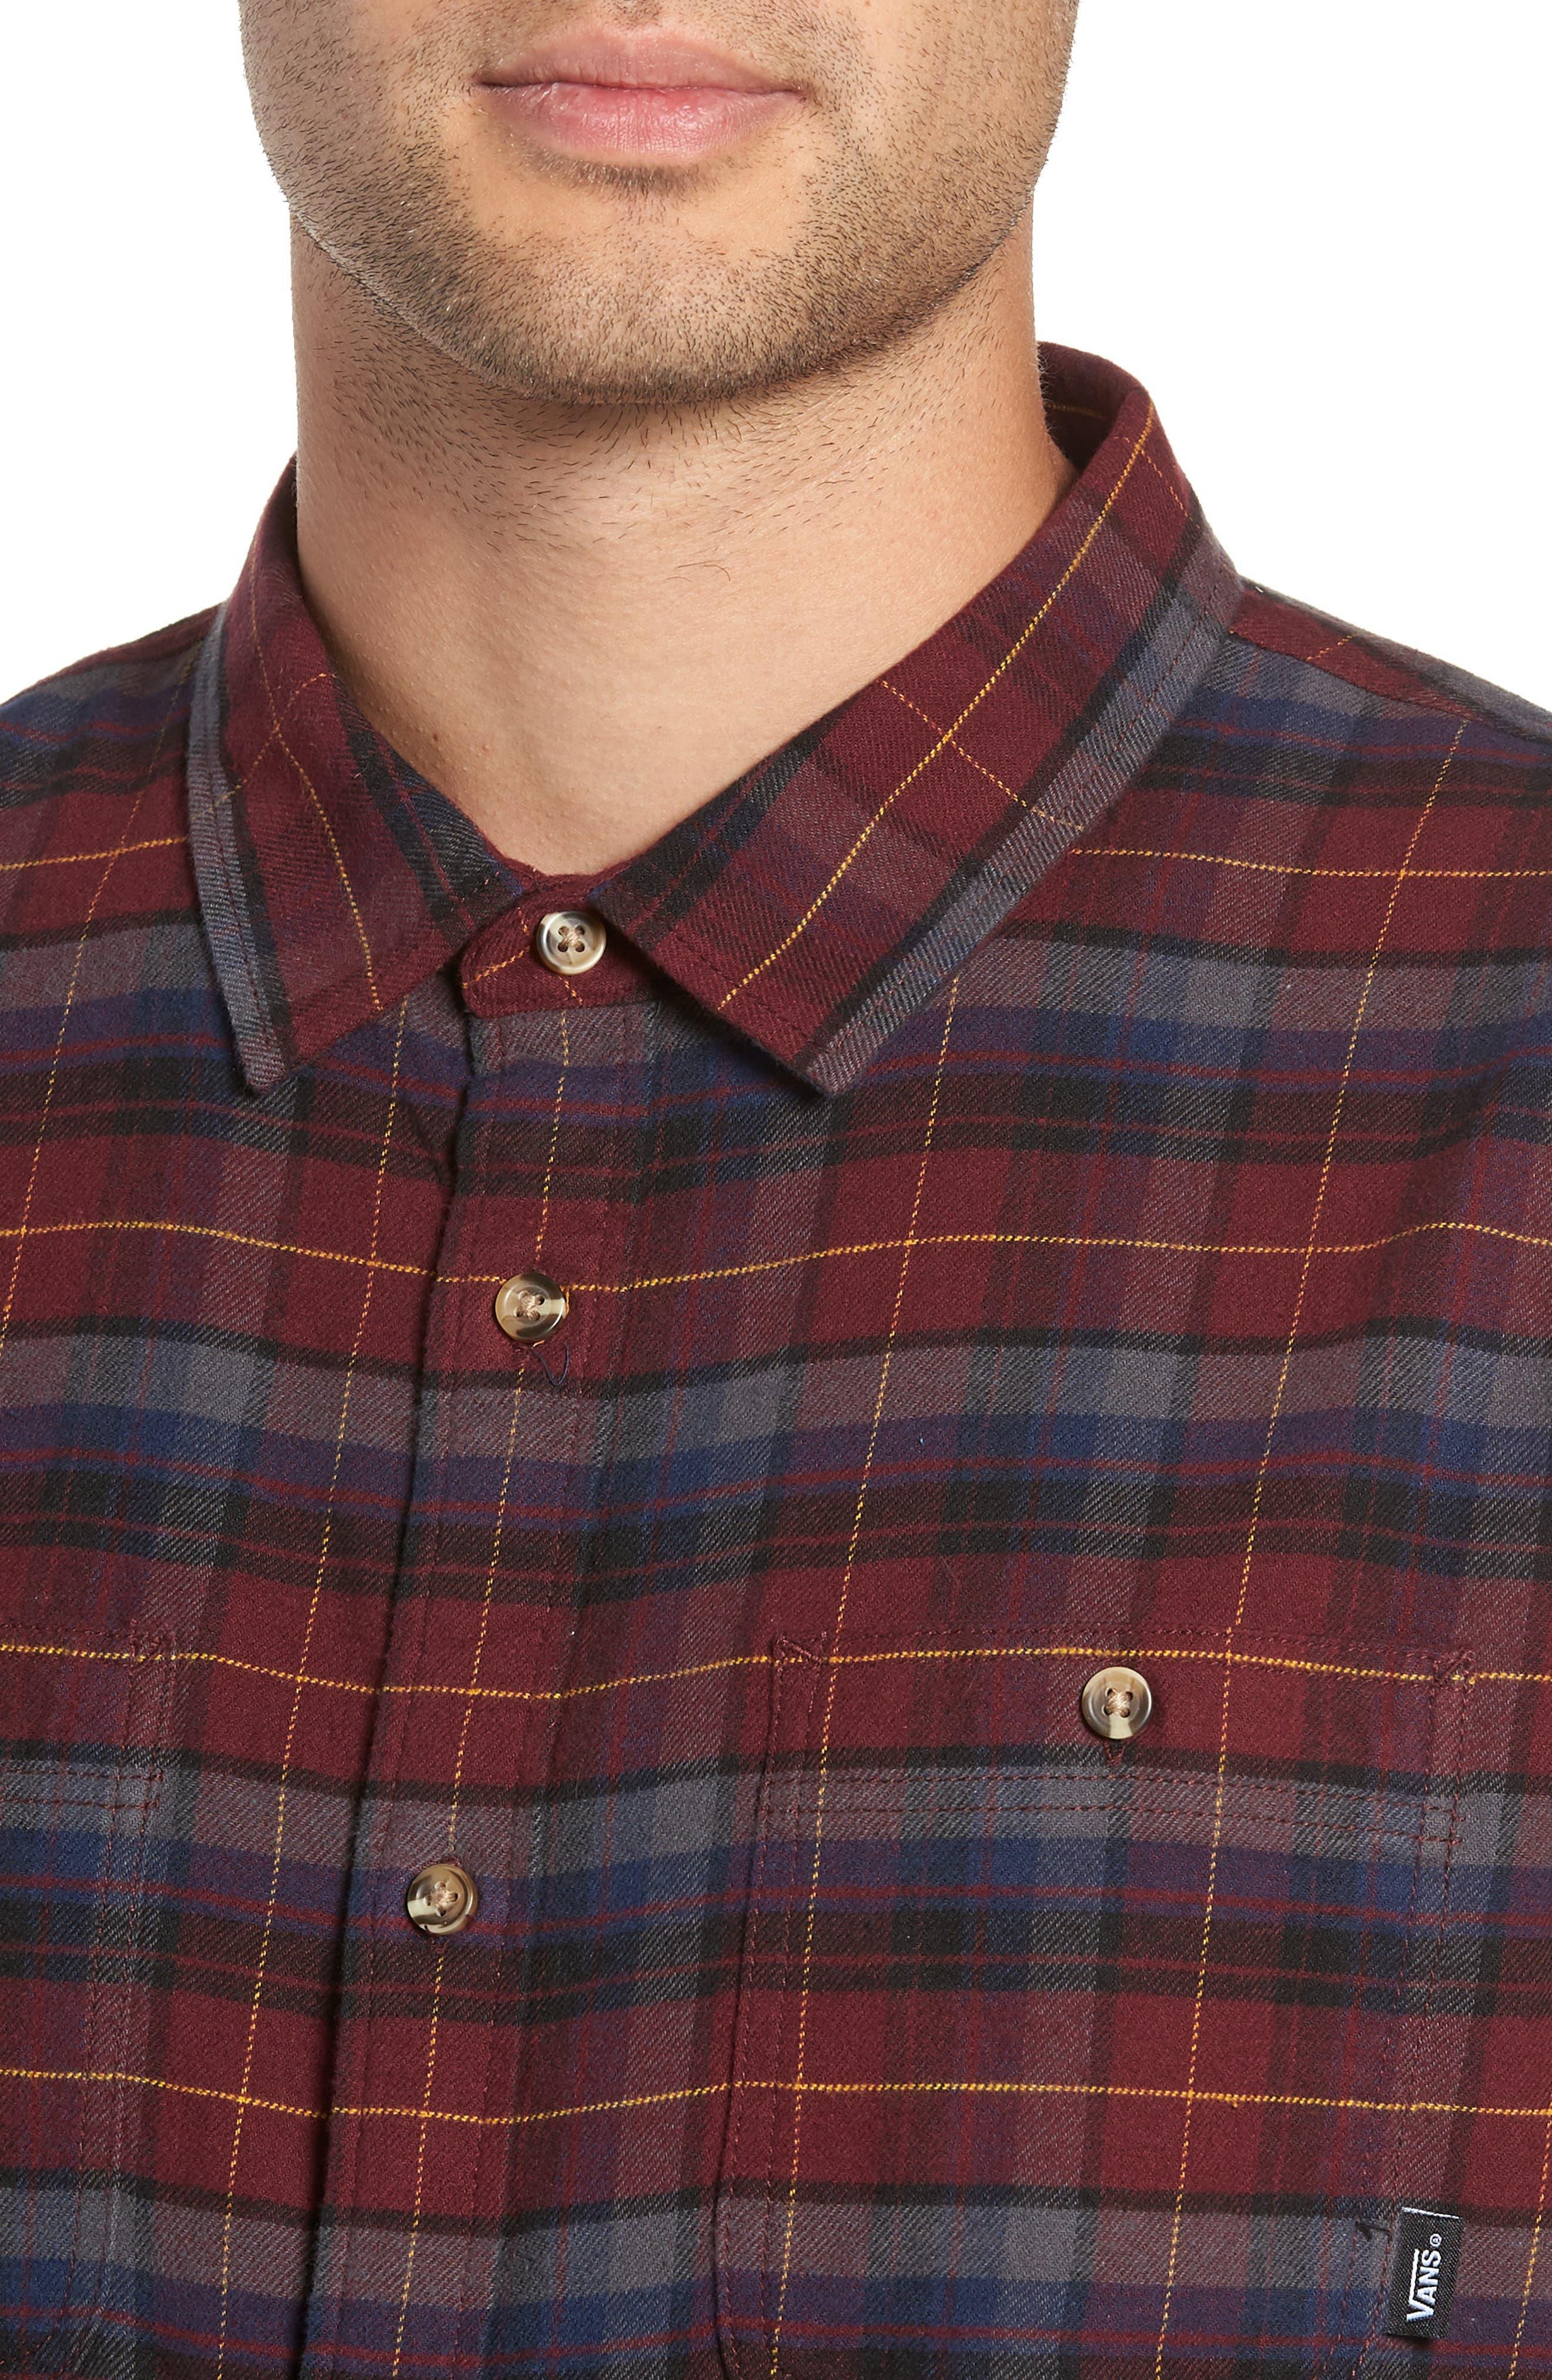 Banfield III Plaid Flannel Shirt,                             Alternate thumbnail 2, color,                             930